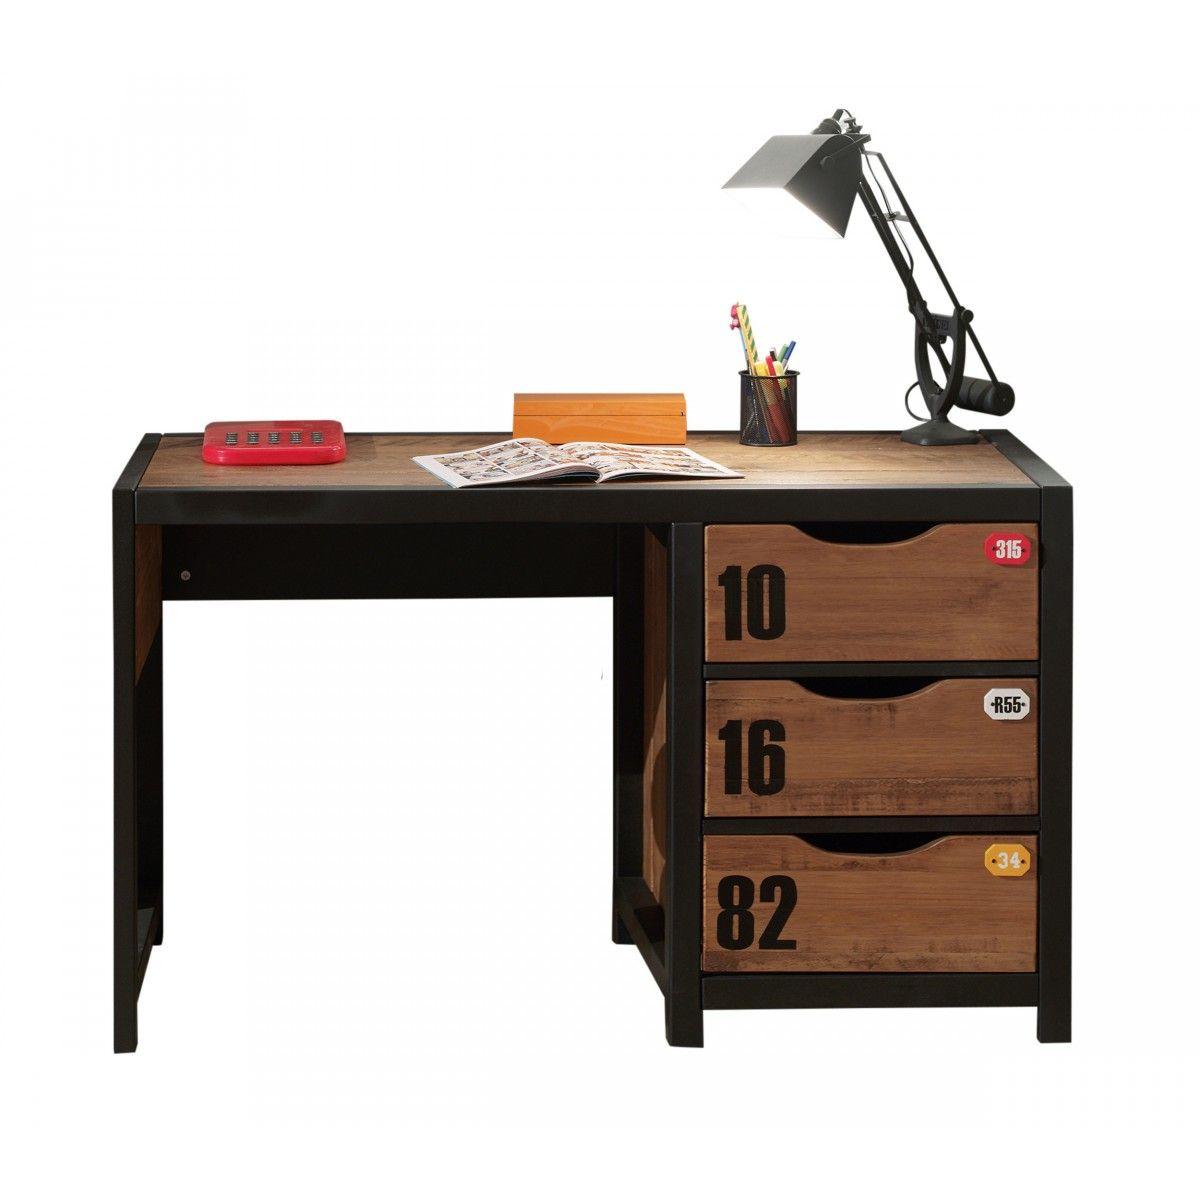 terre bureau enfant bois m tal victor de nuit. Black Bedroom Furniture Sets. Home Design Ideas